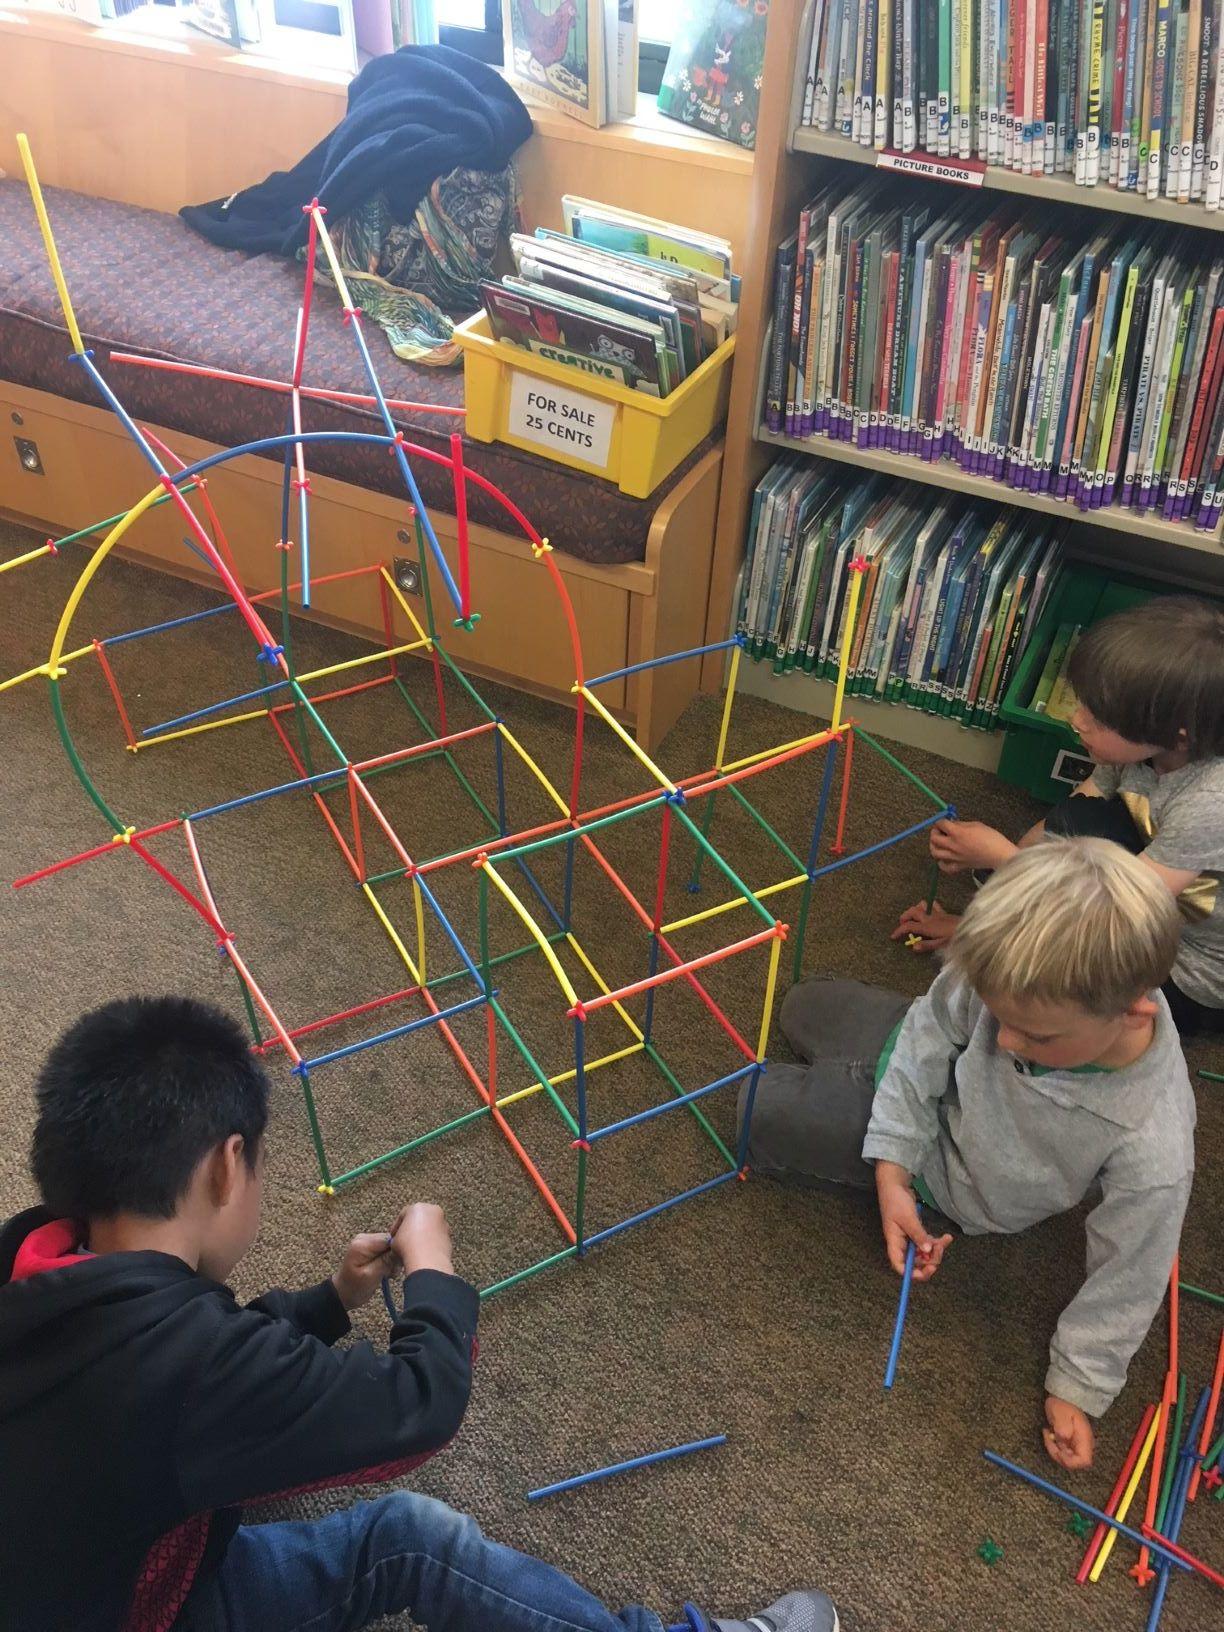 kids in library.JPG